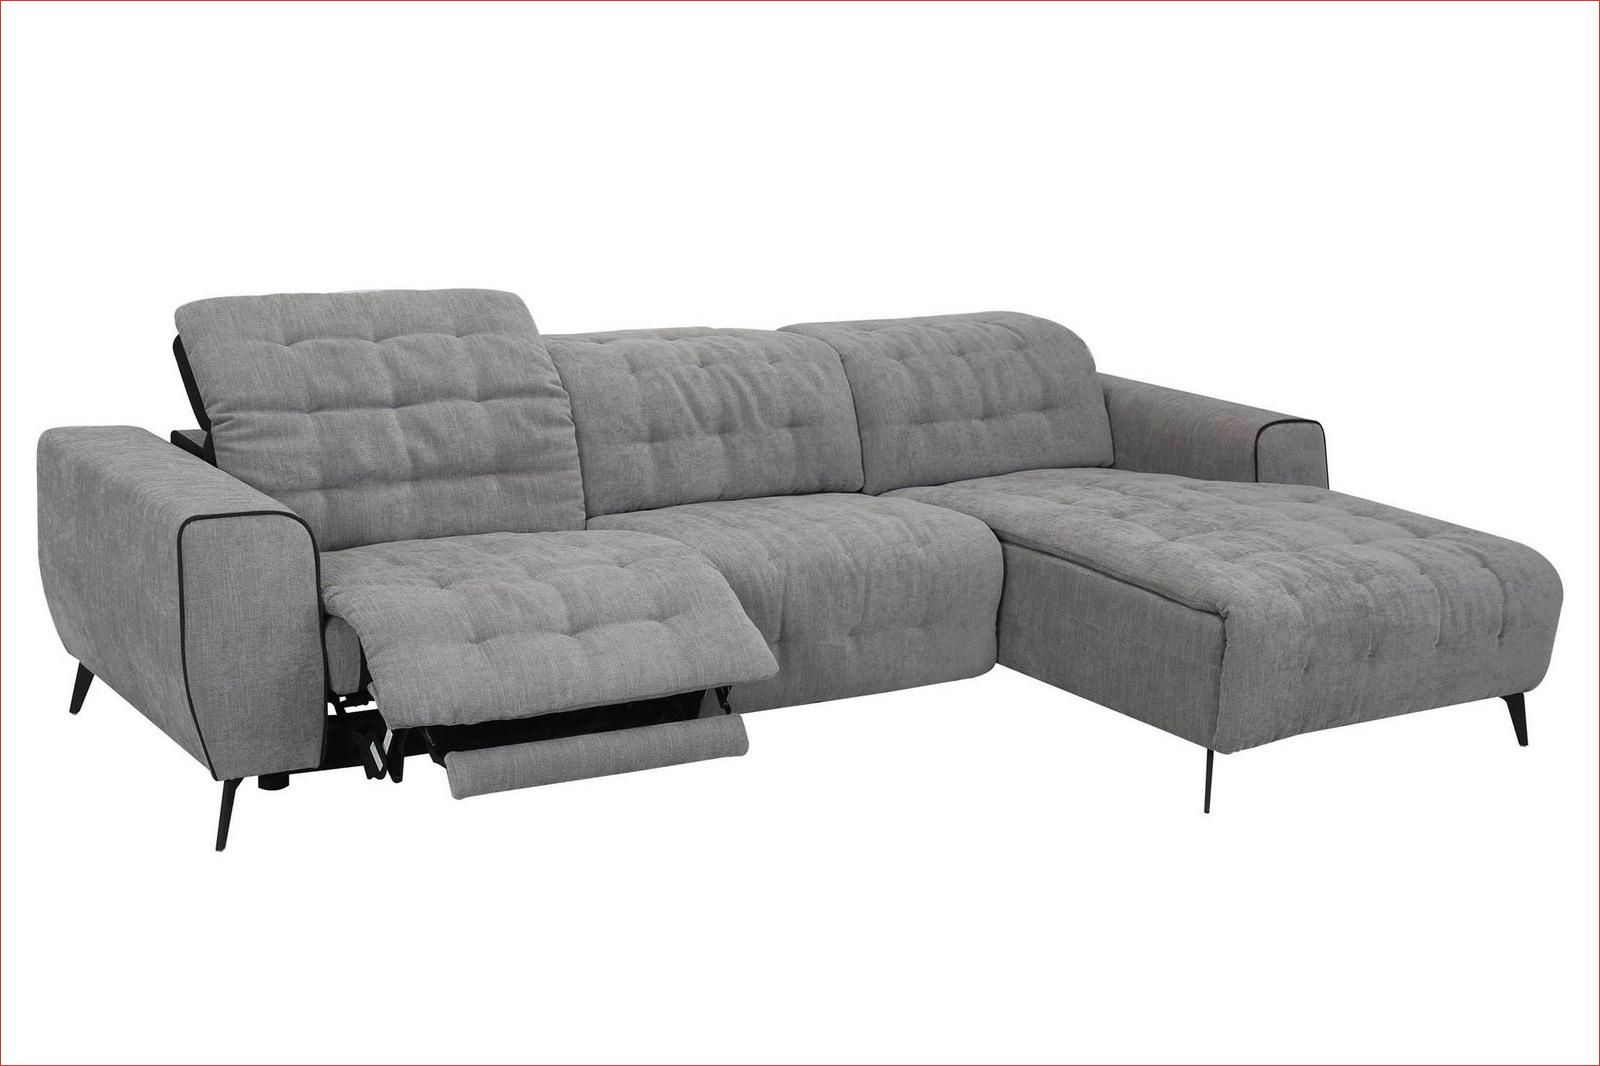 13 Grand Canape Angle Relax Electrique Stock Di 2020